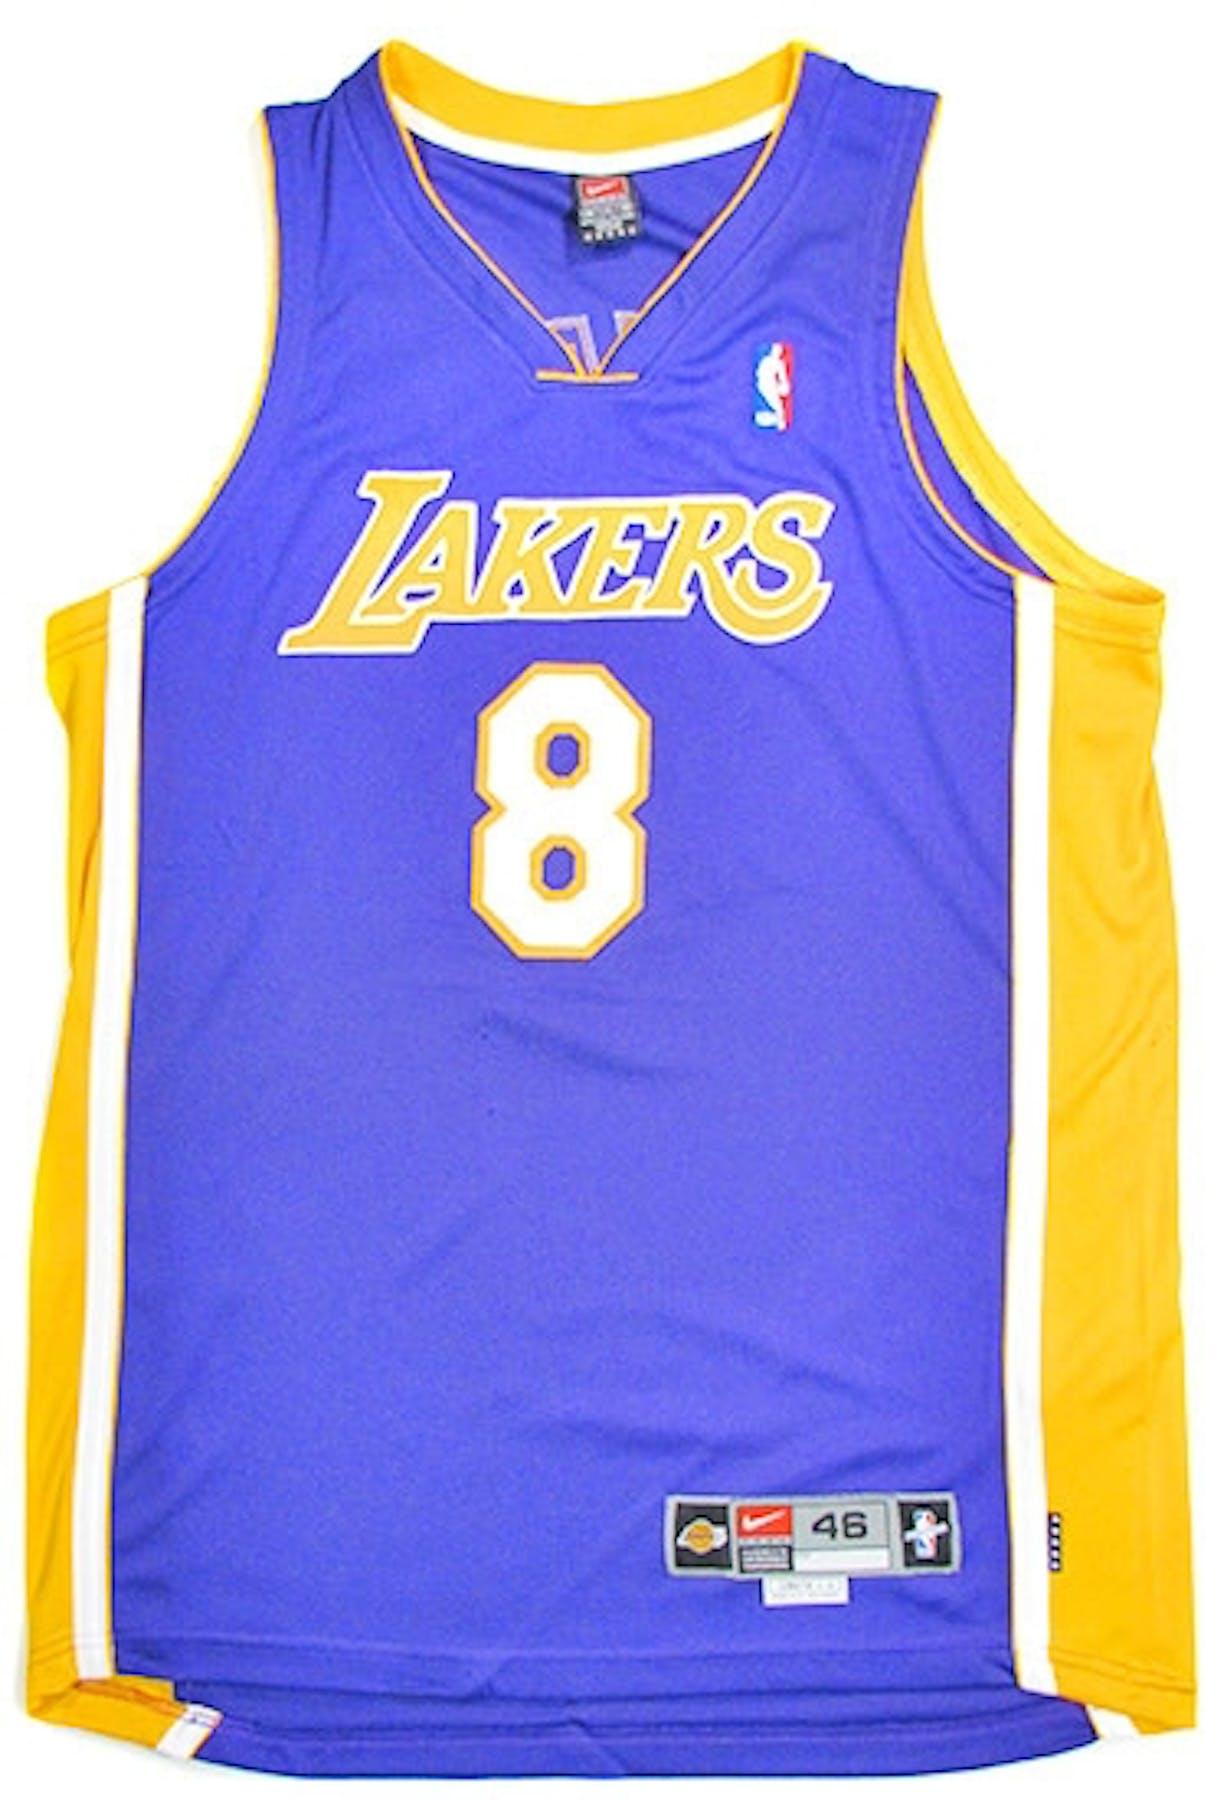 1fea4e592d7a Kobe Bryant Autographed L.A. Lakers Authentic Purple Jersey (UDA ...